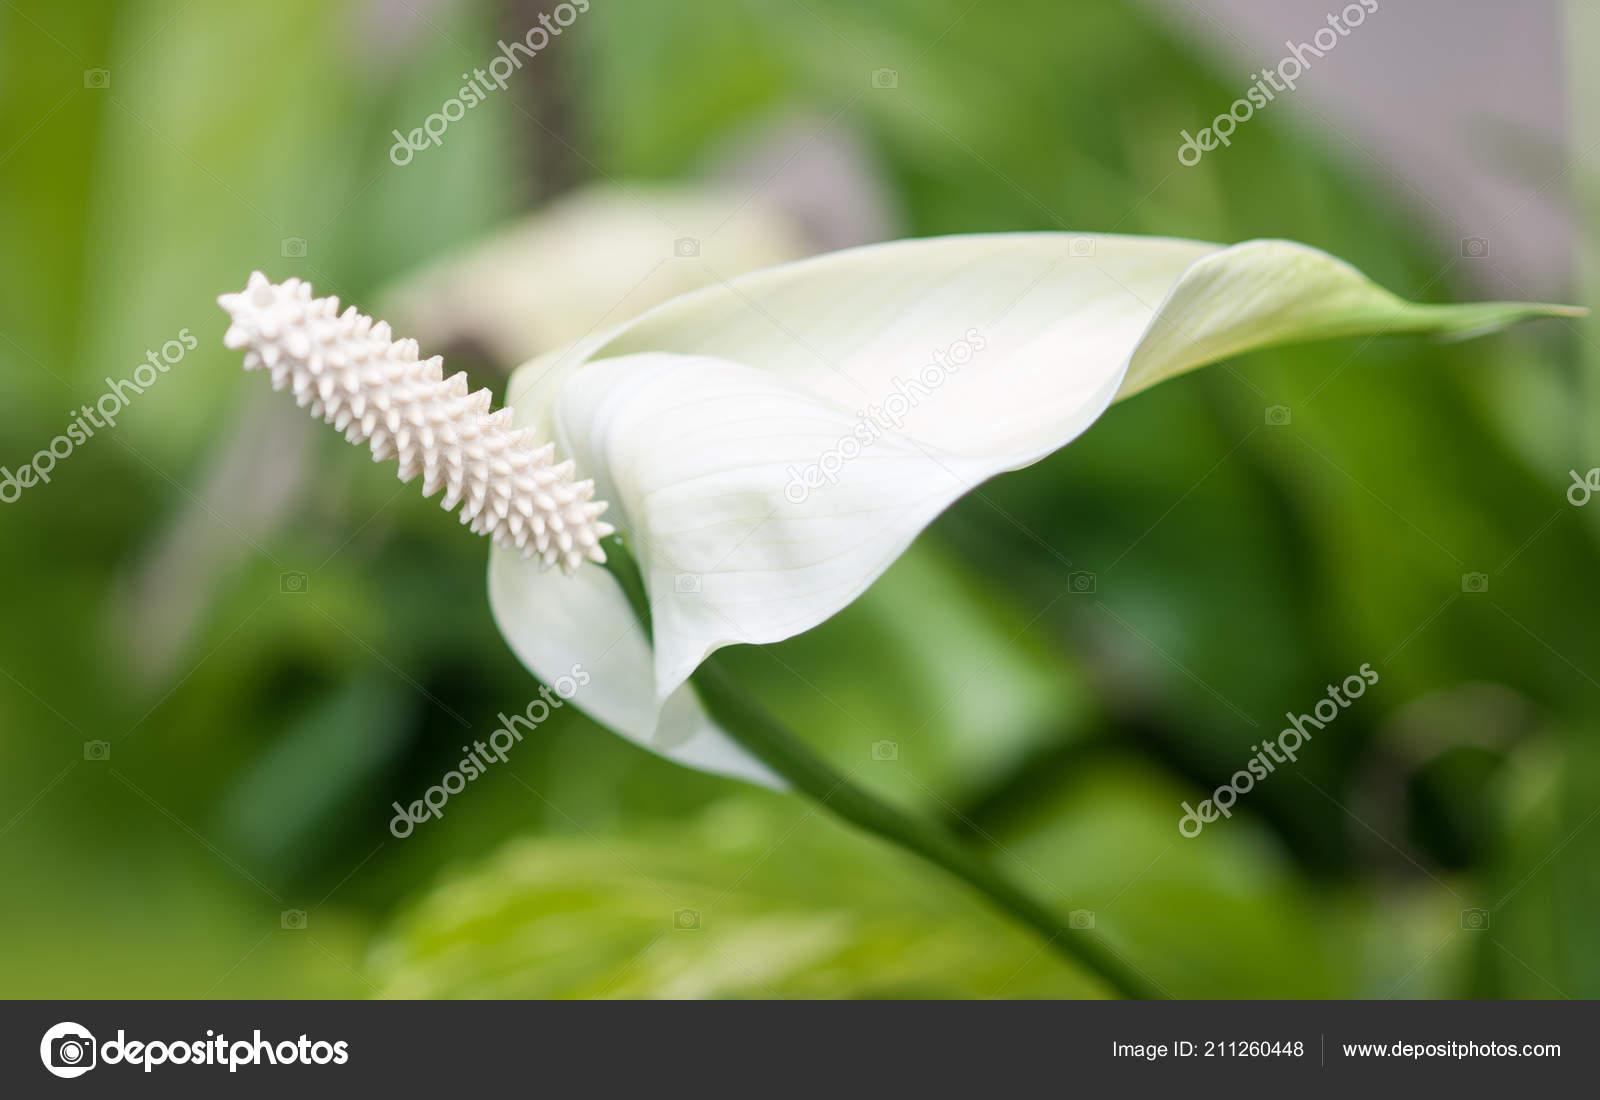 Photo Exotic Tropical White Anthurium Flamingo Flower Nature Garden